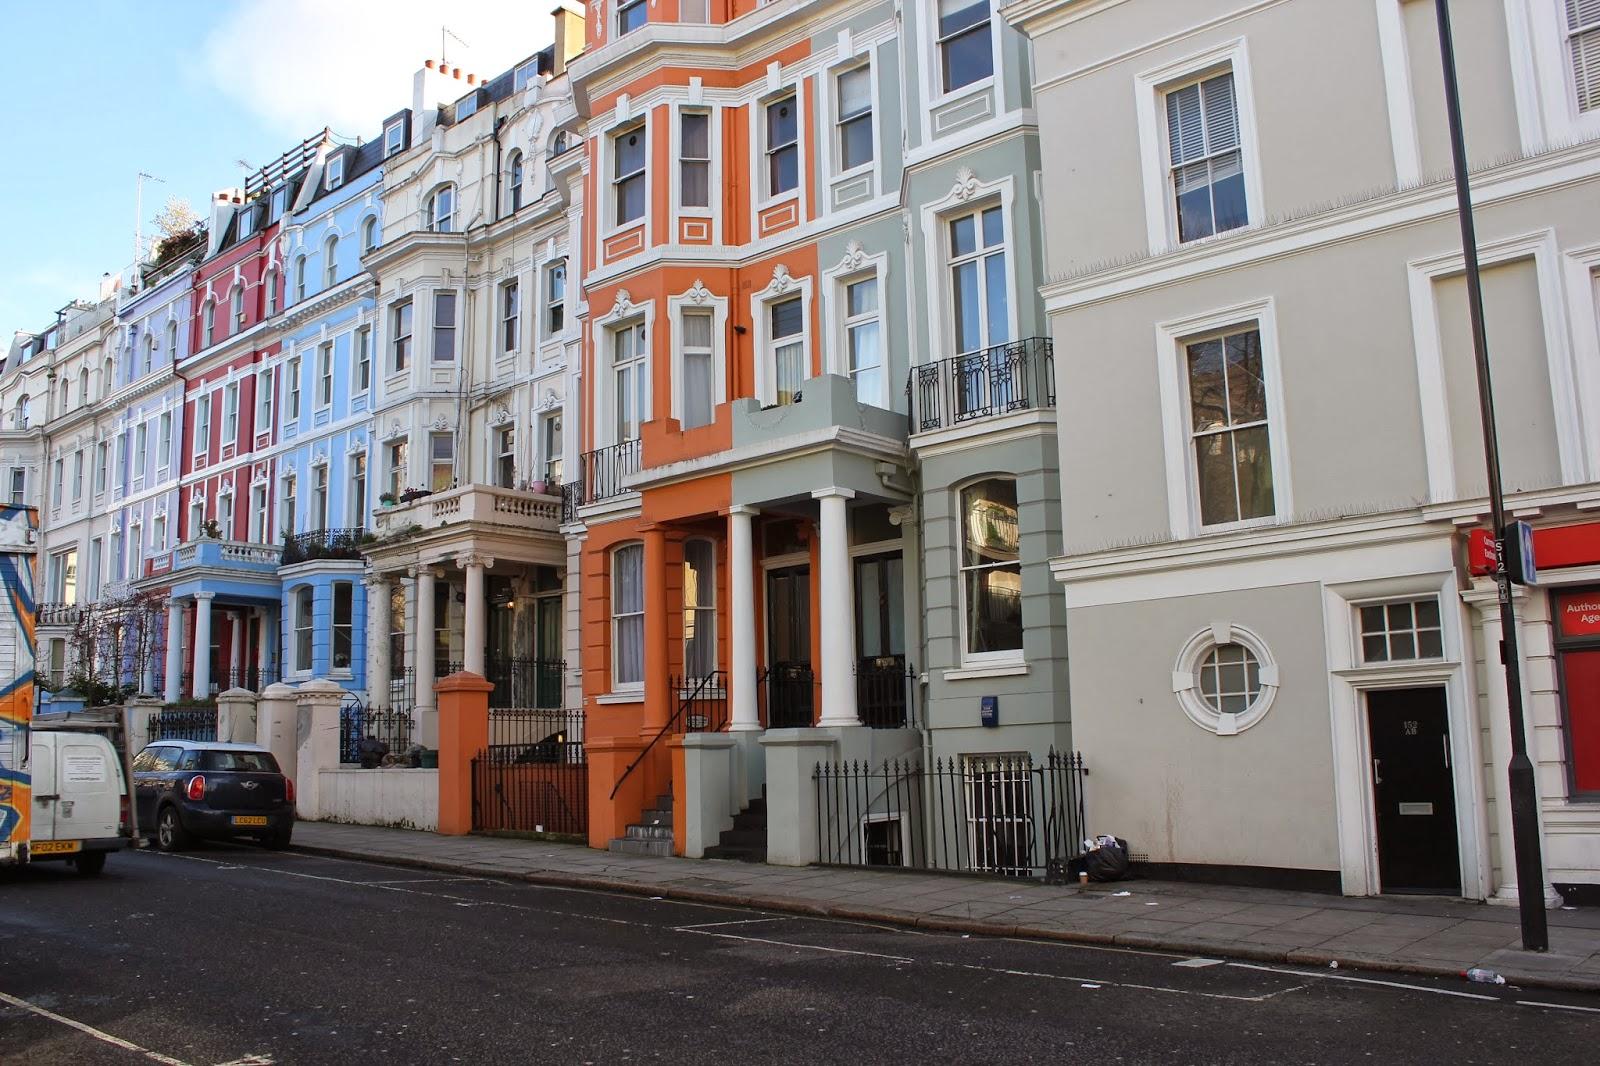 portobello road london notting hill. Black Bedroom Furniture Sets. Home Design Ideas